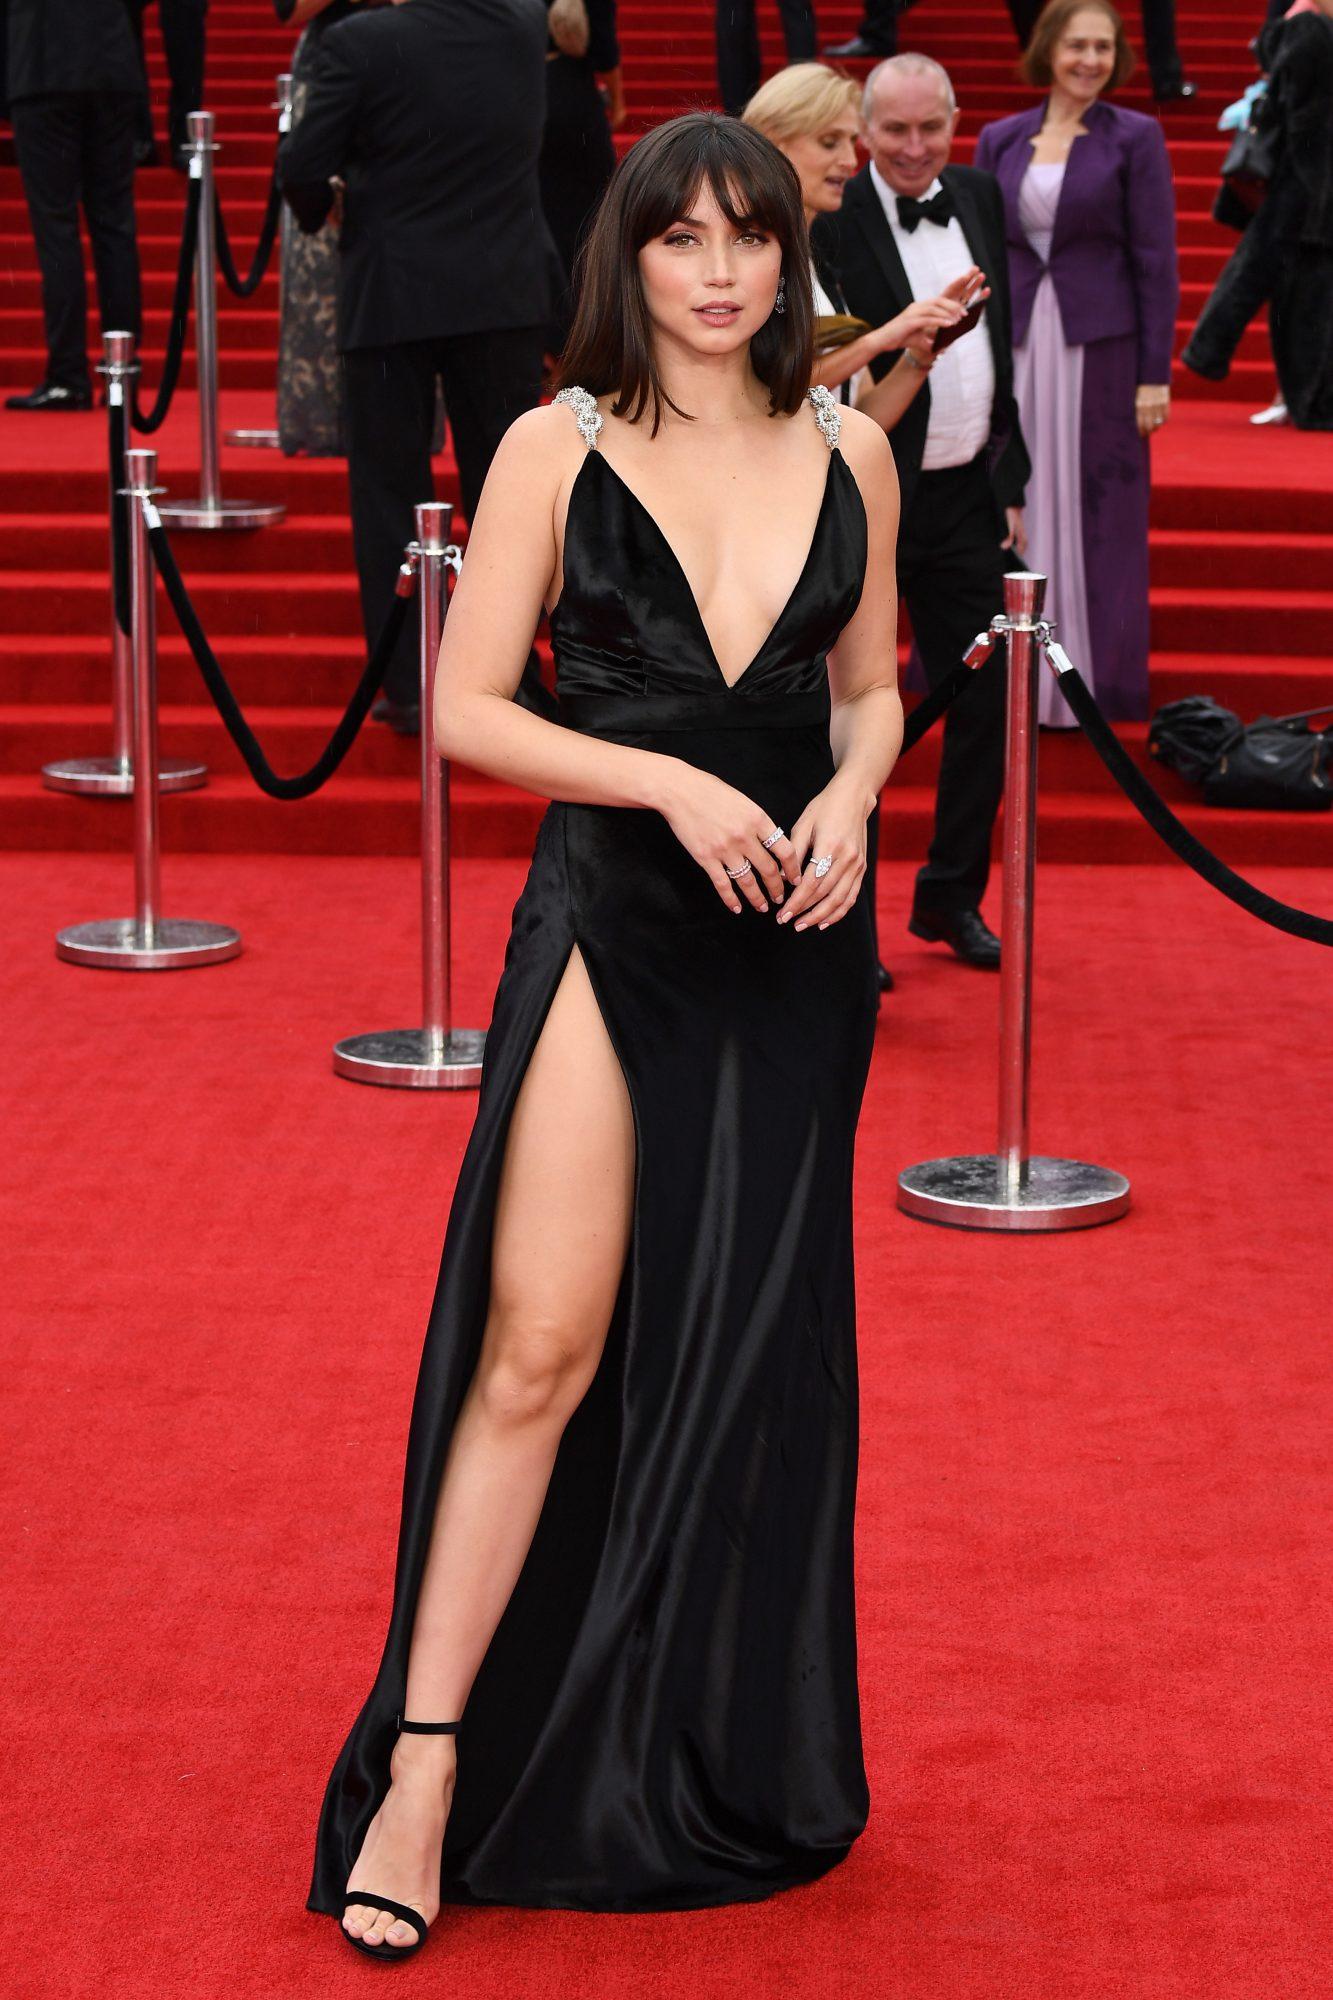 James Bond, No Time to Die estreno, alfombra roja, Ana De Armas